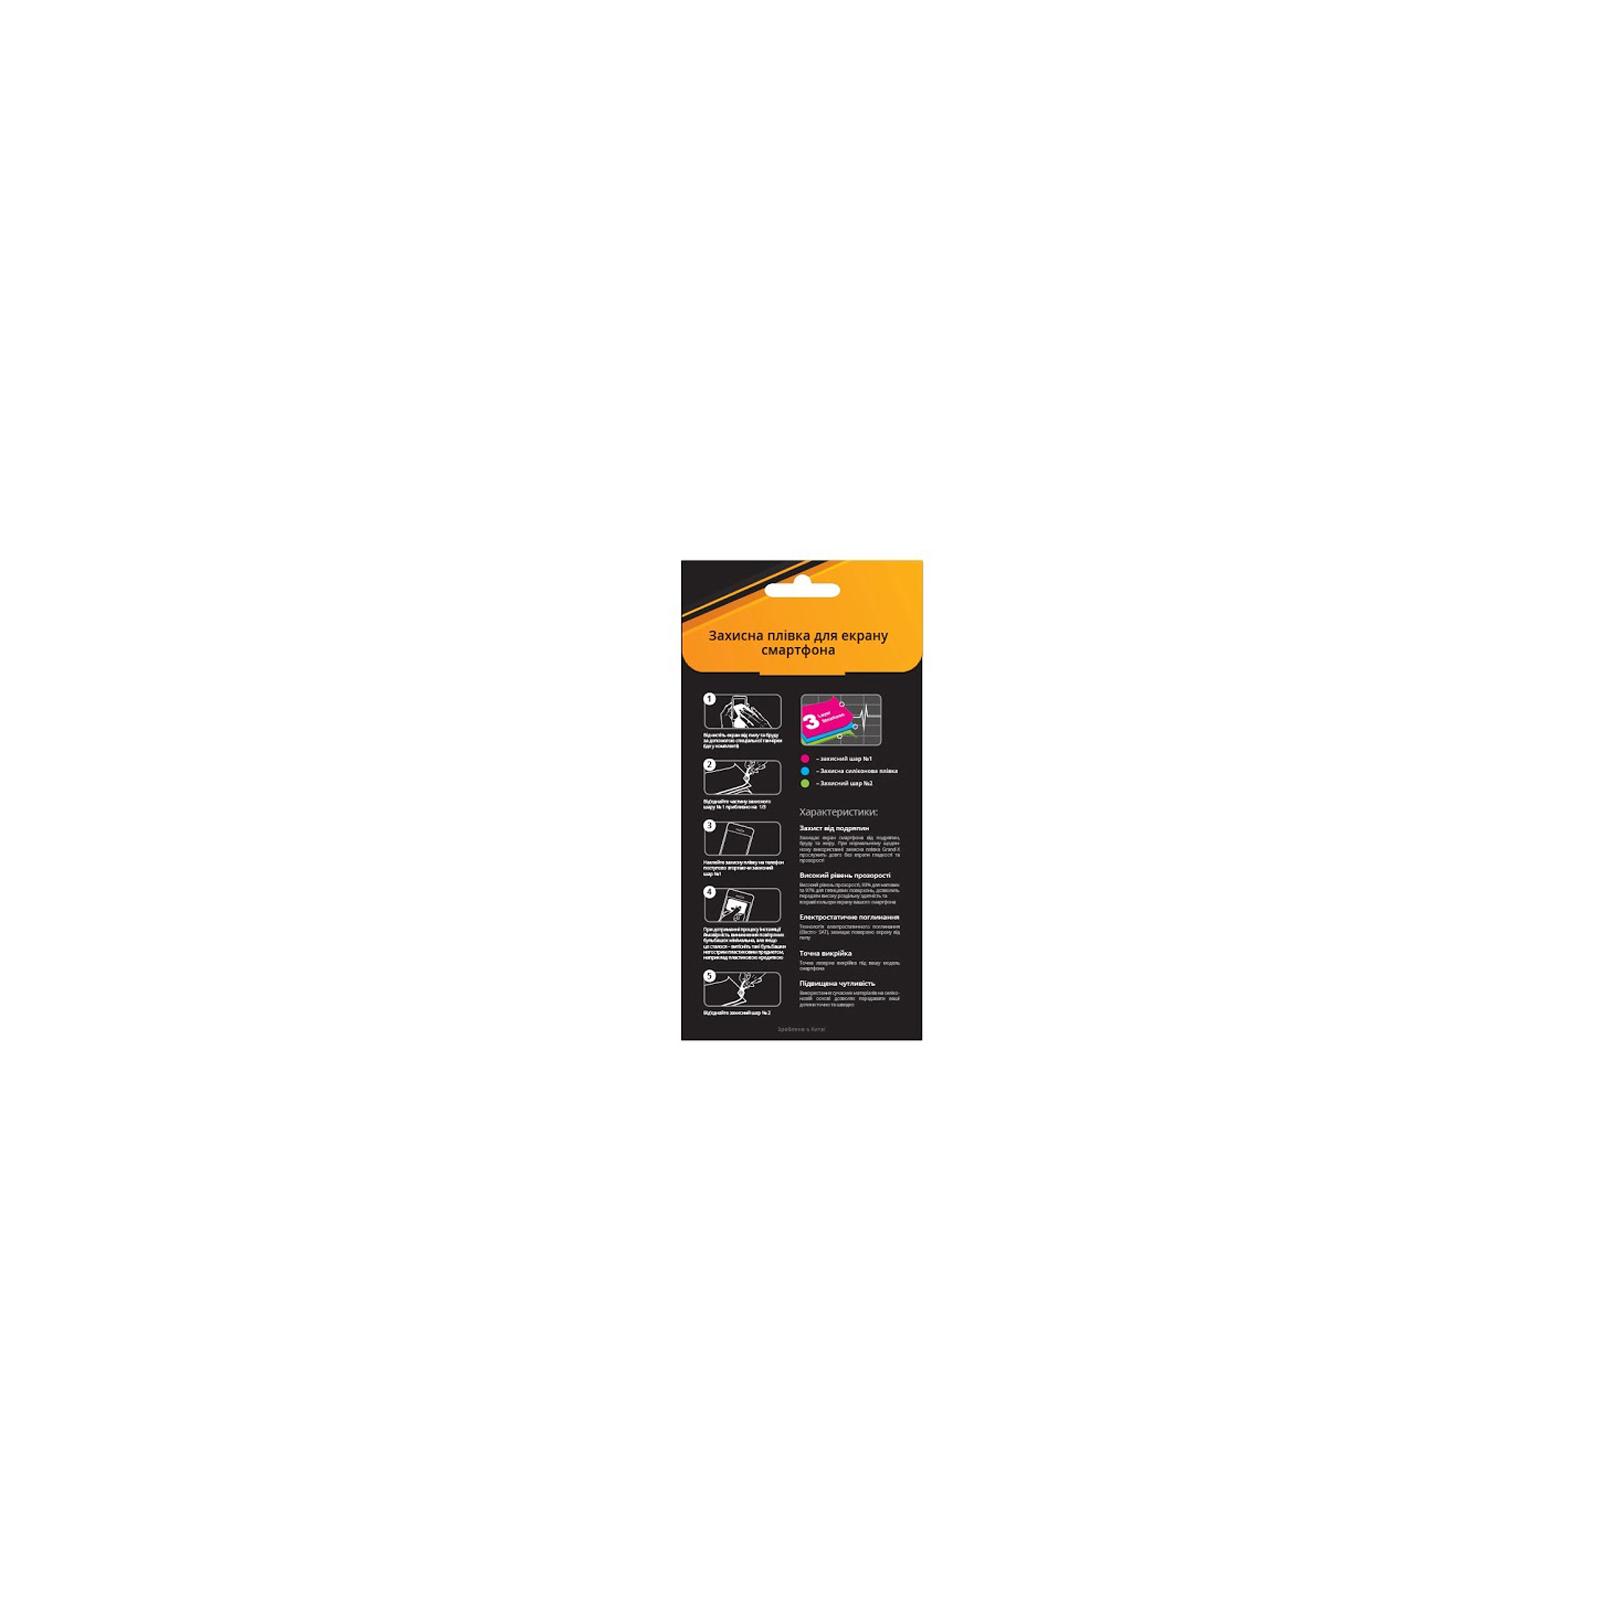 Пленка защитная Grand-X Samsung G900 Galaxy S5 (PZGAGSGS5) изображение 2